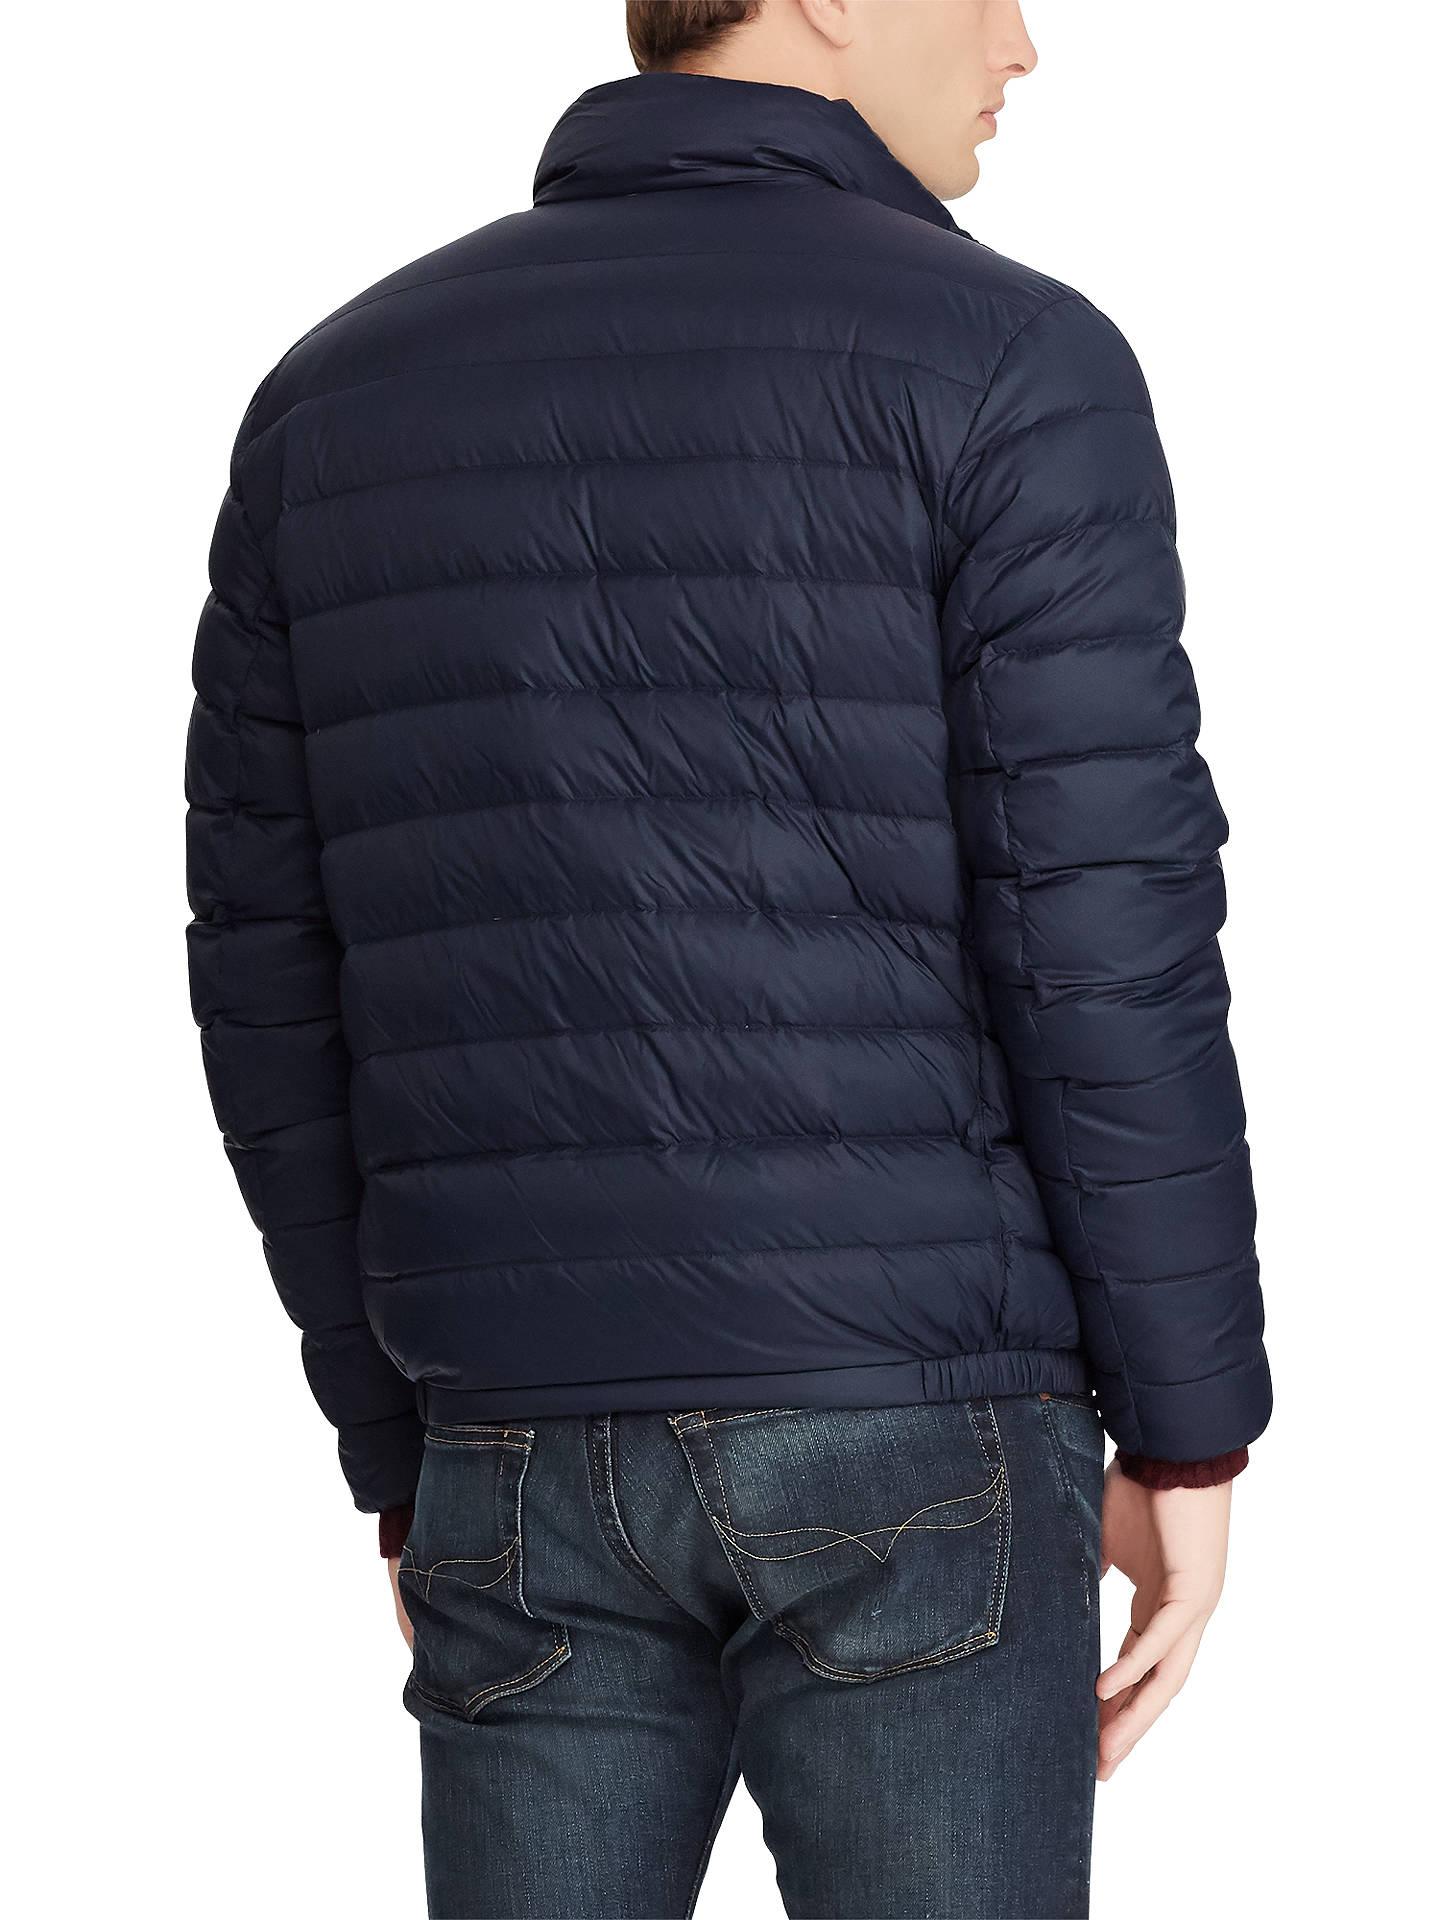 ec8096480 Polo Ralph Lauren Bleeker Quilted Jacket at John Lewis & Partners